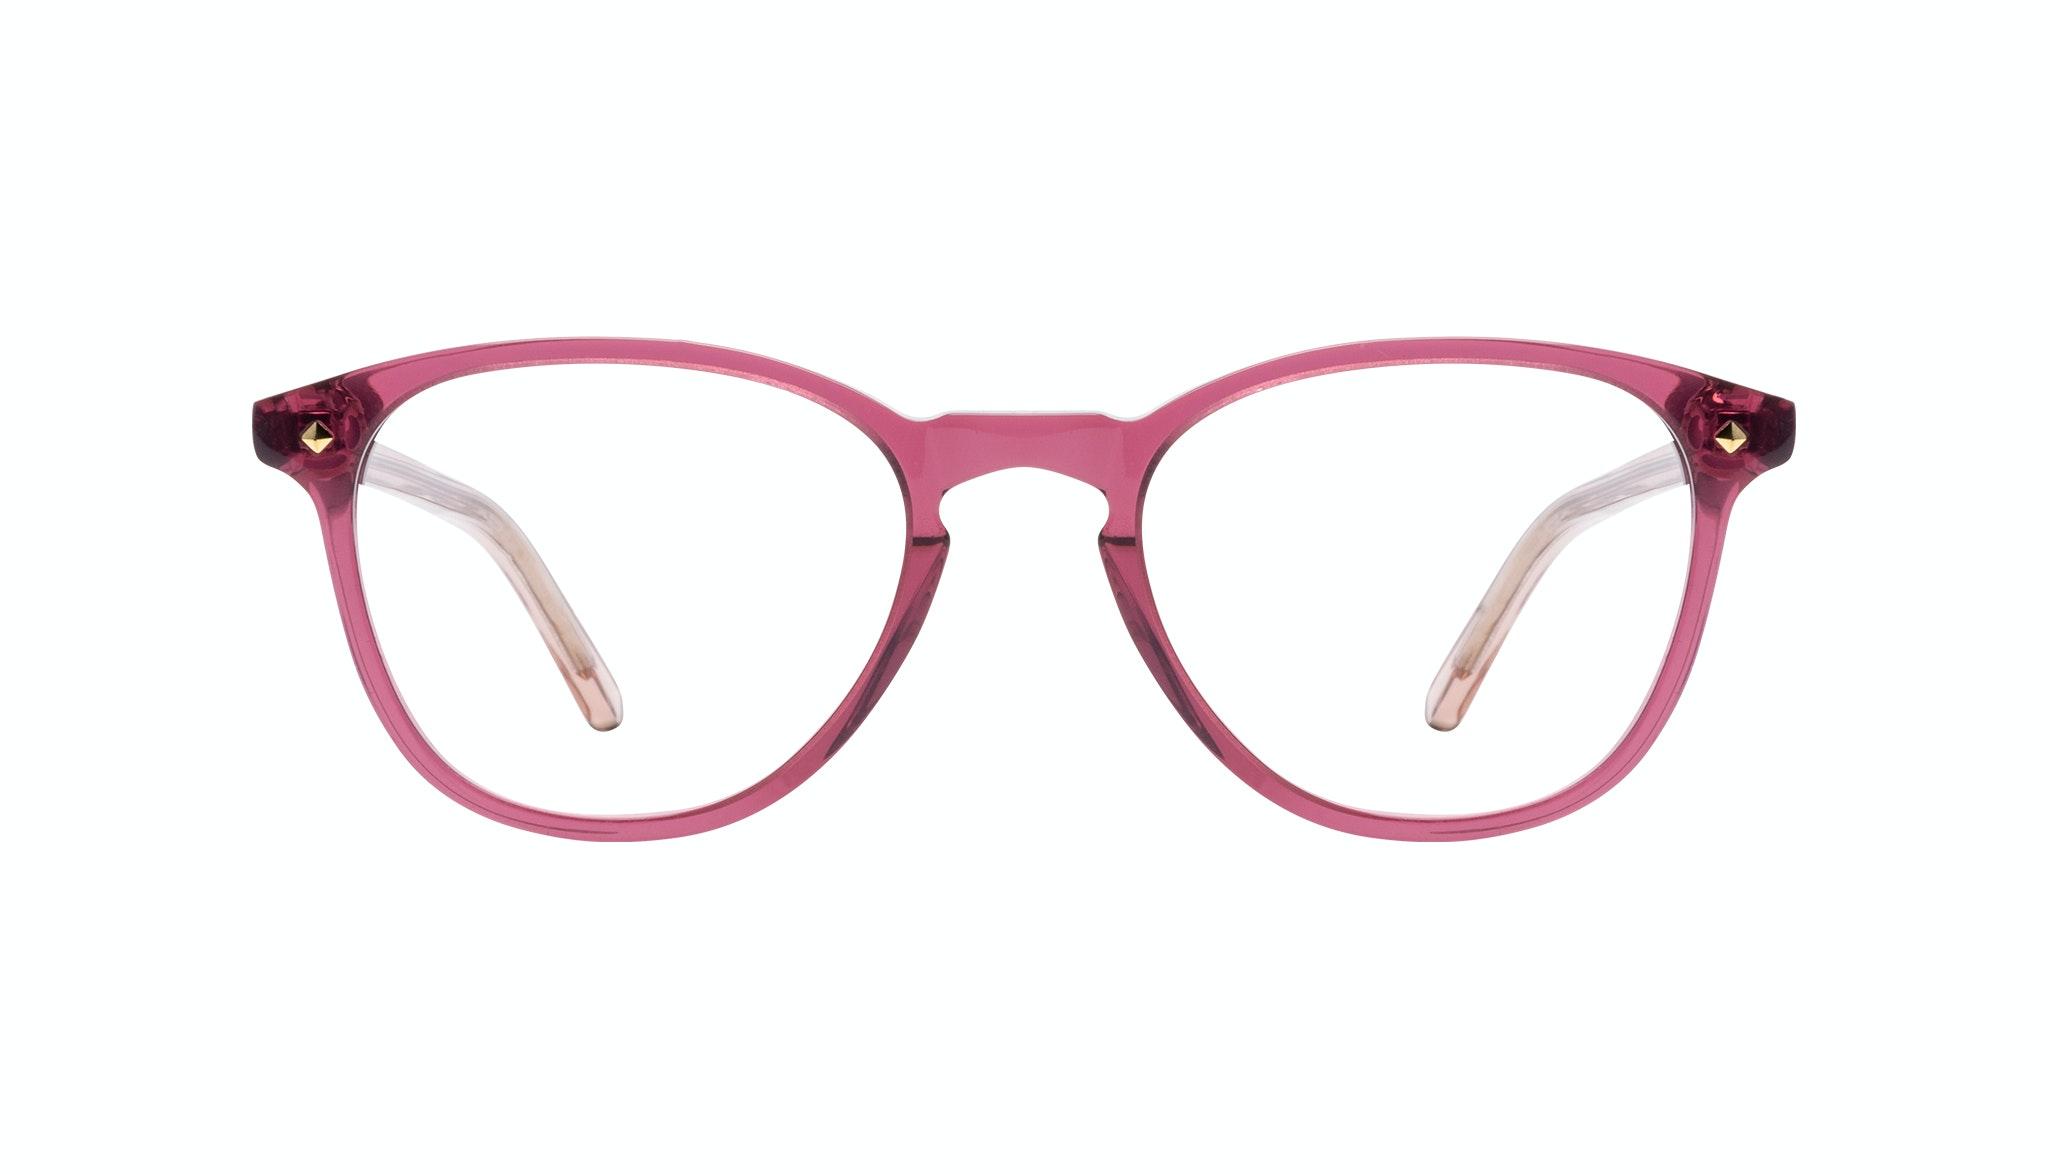 Affordable Fashion Glasses Round Eyeglasses Women Crush Berry